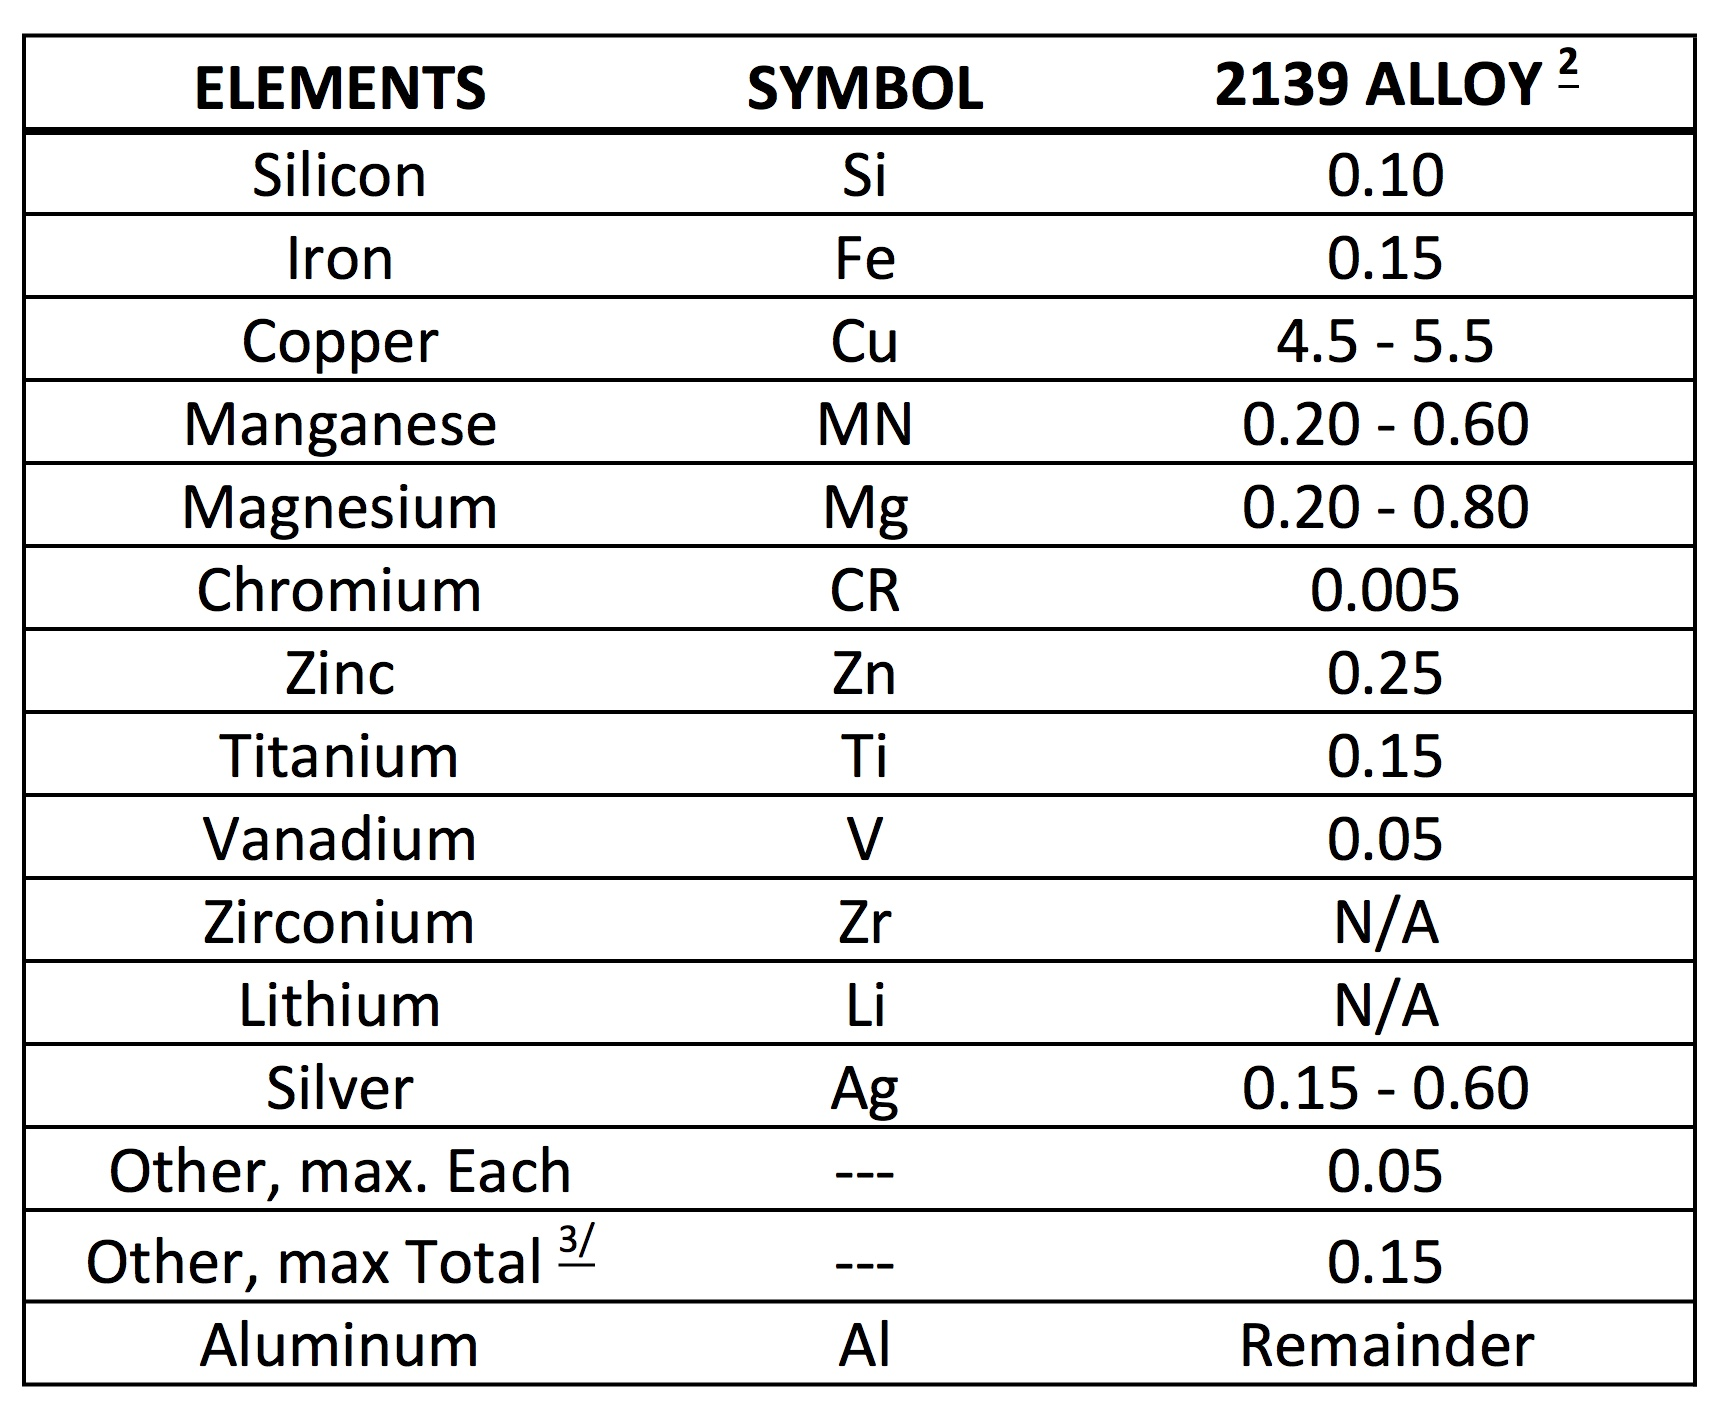 Chemical analysis of aluminum alloy 2139